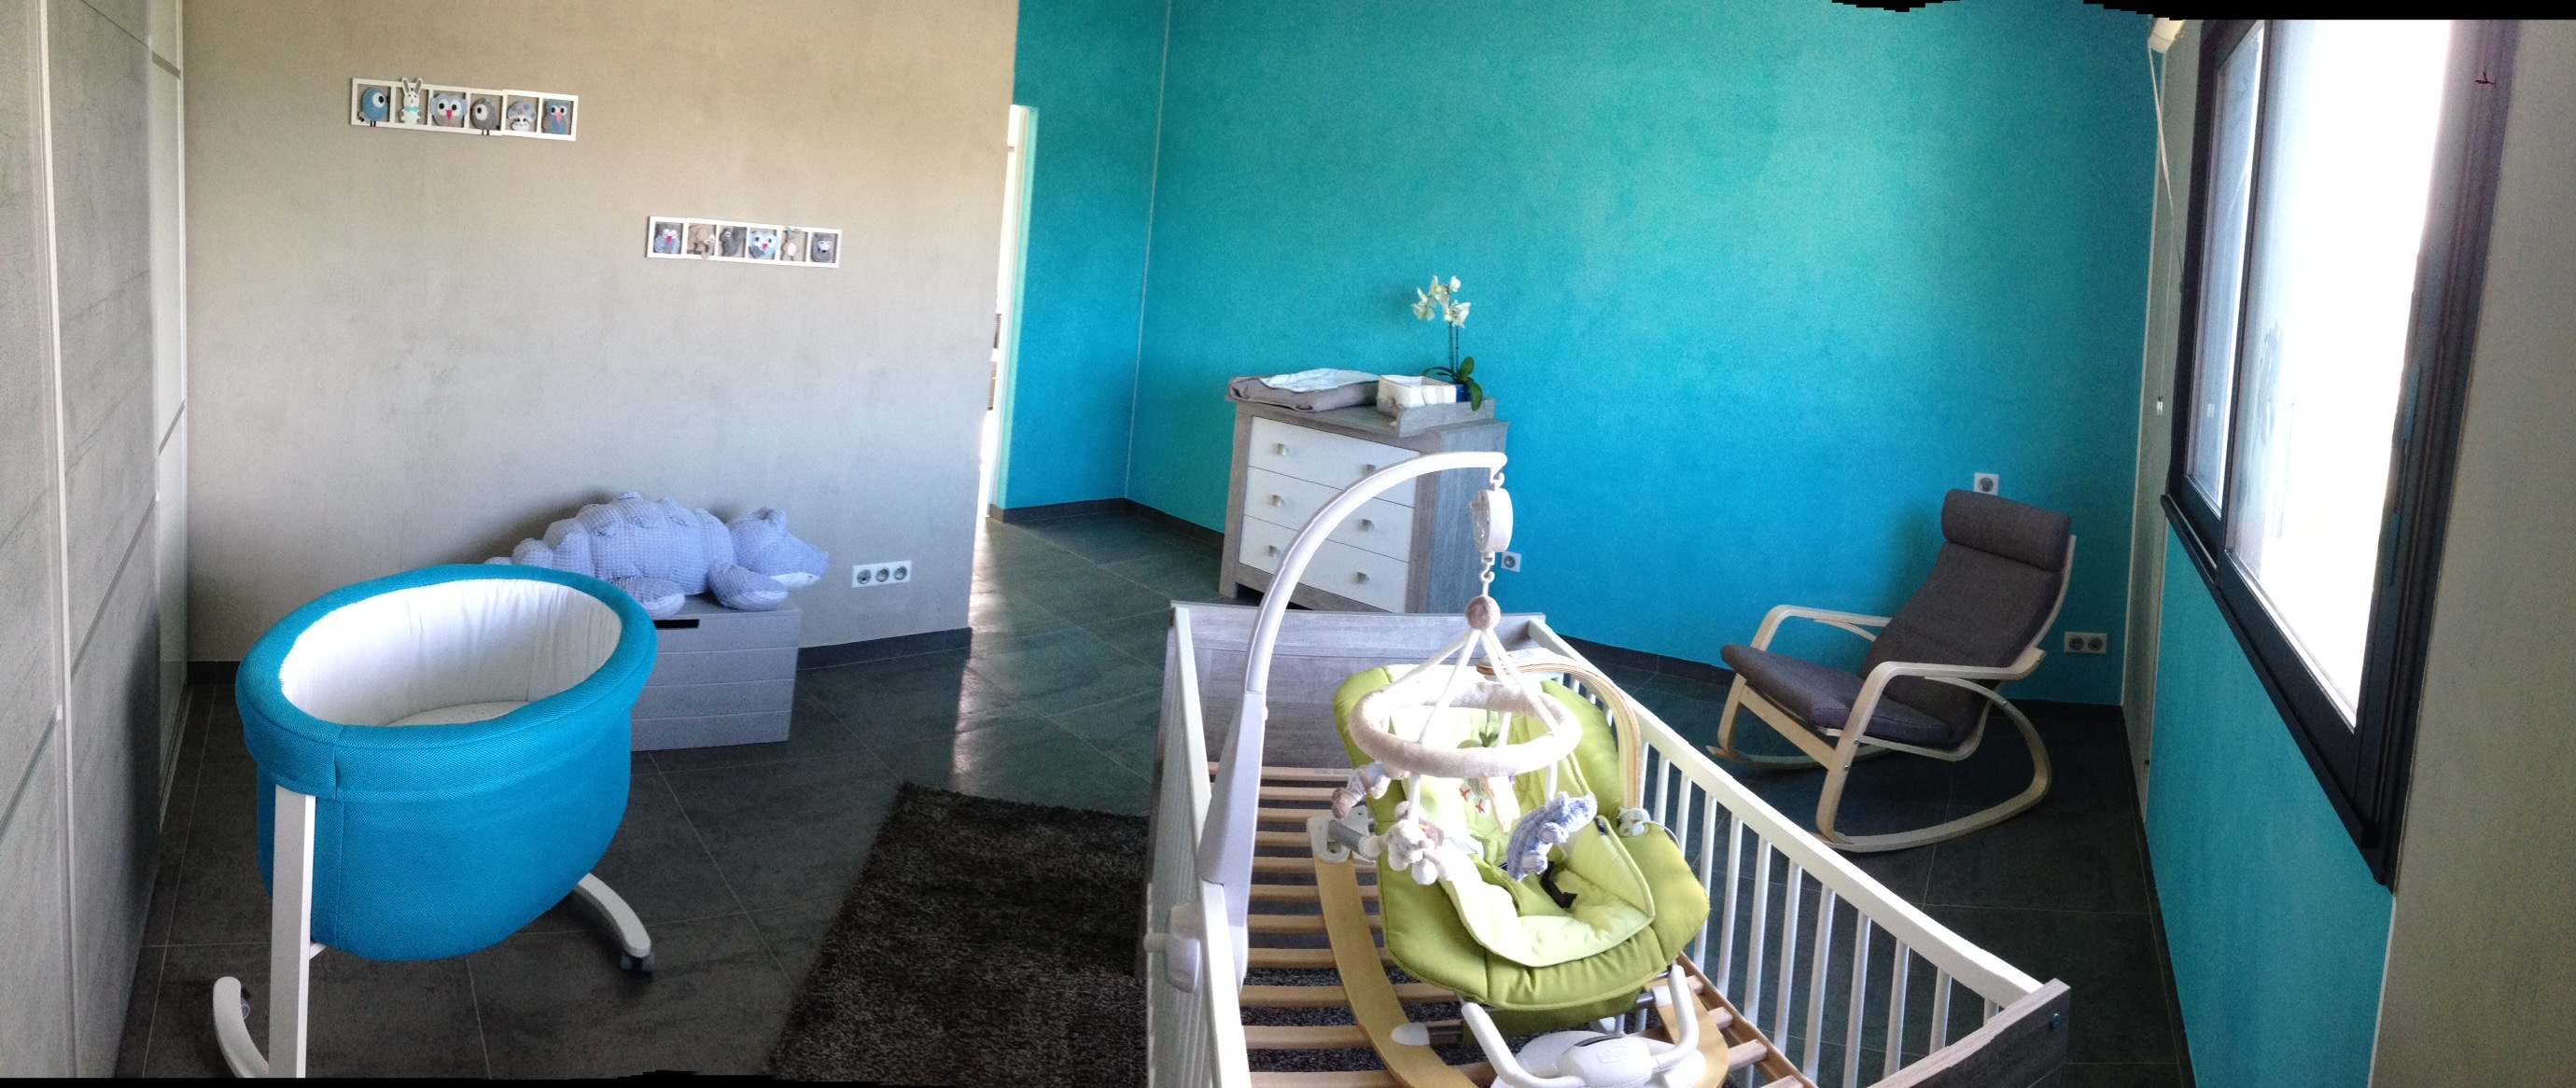 d coration murale chambre b b figurines maisons bleues. Black Bedroom Furniture Sets. Home Design Ideas